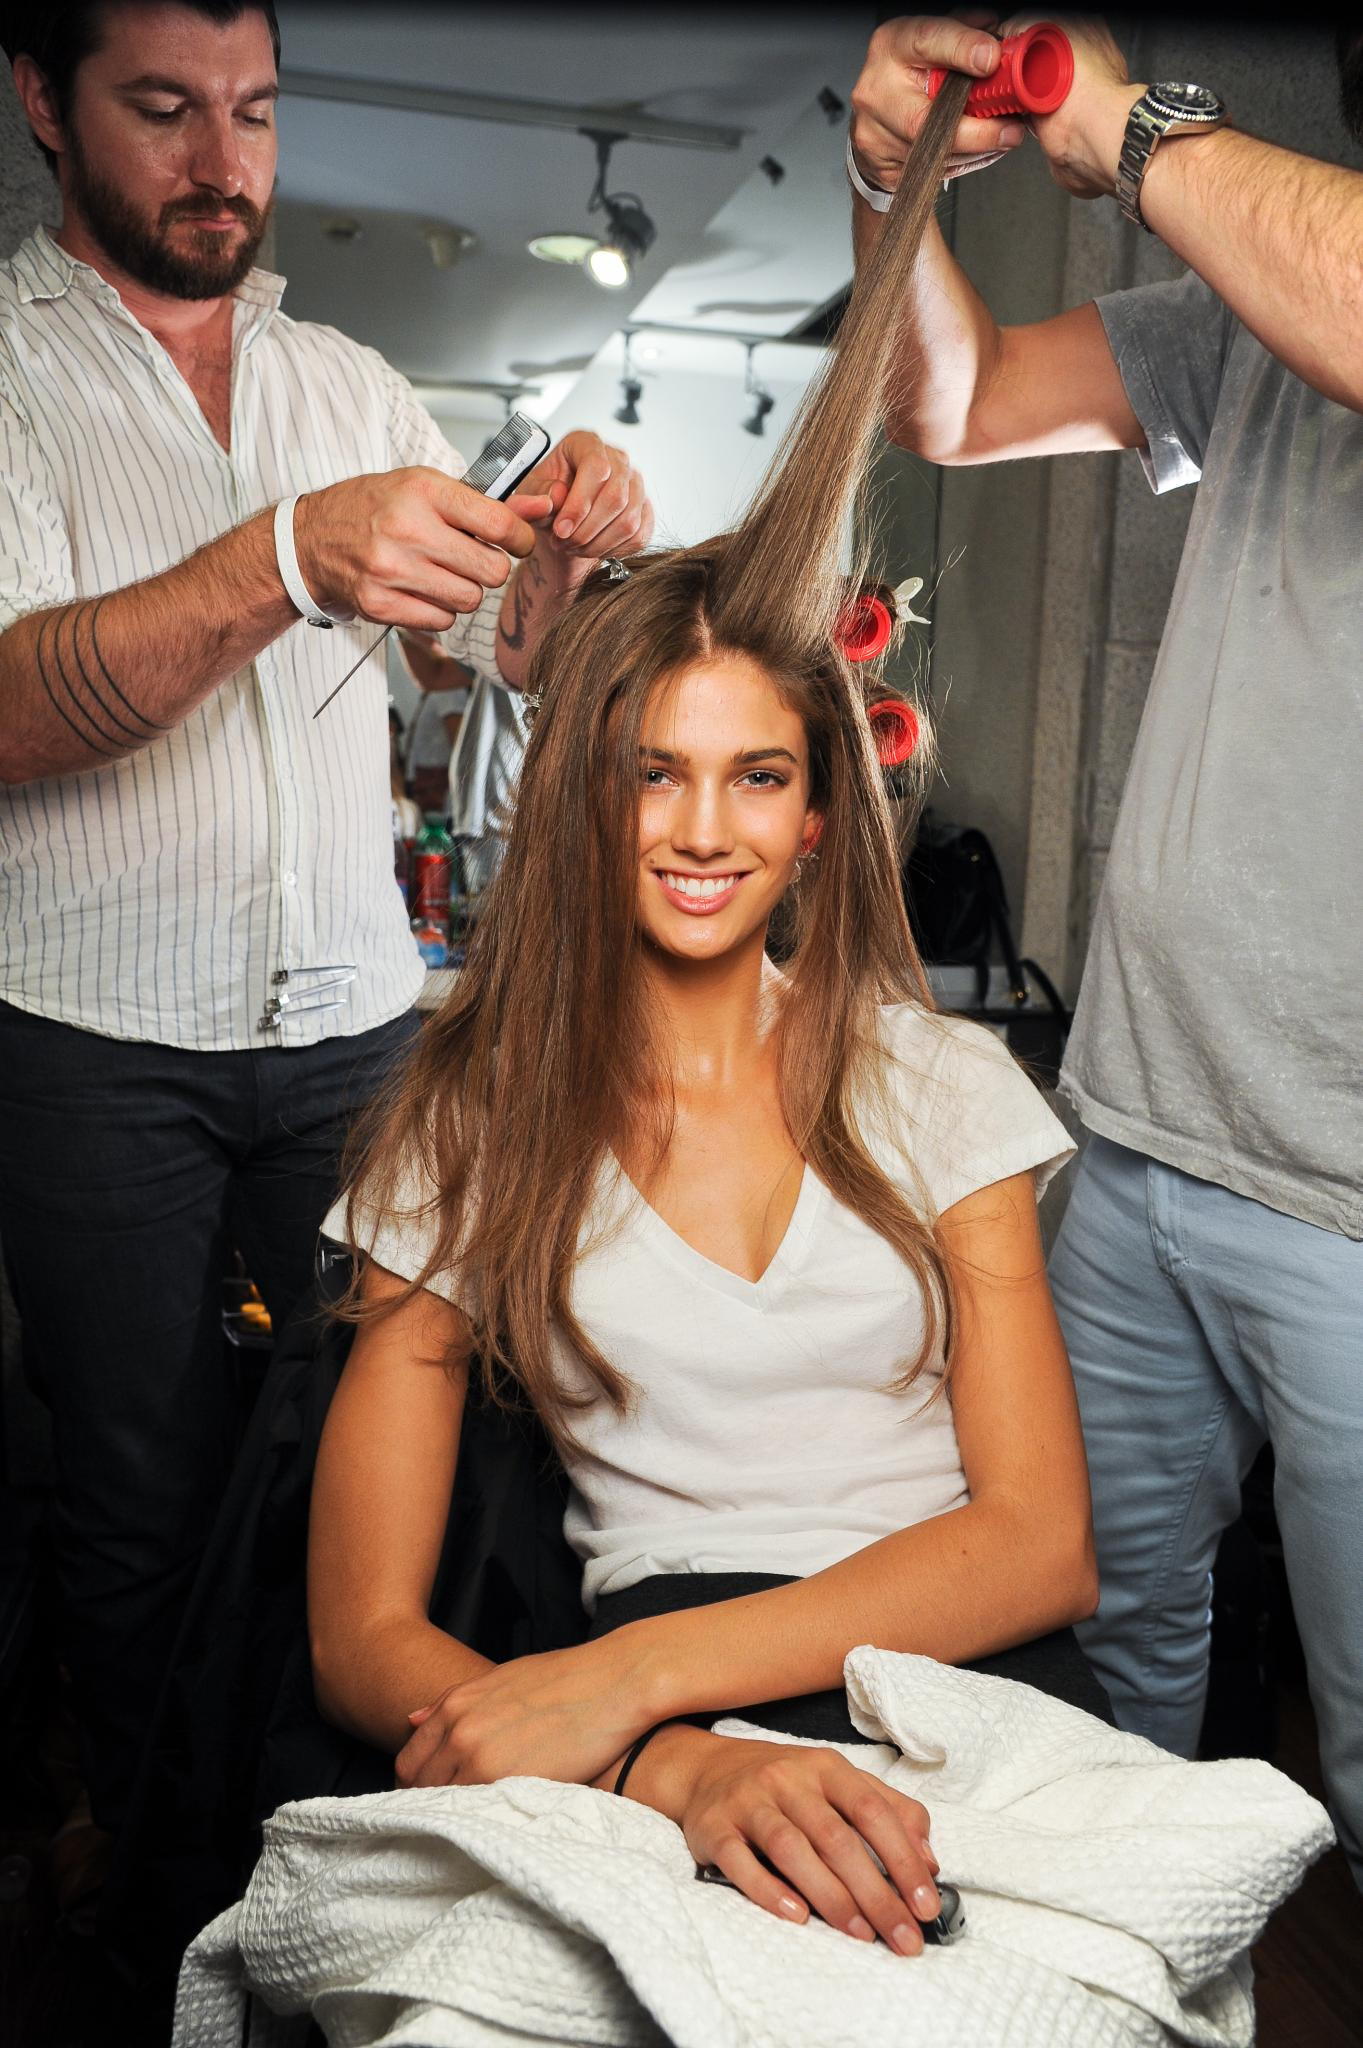 pelo largo castaño liso peinado cuidado versace